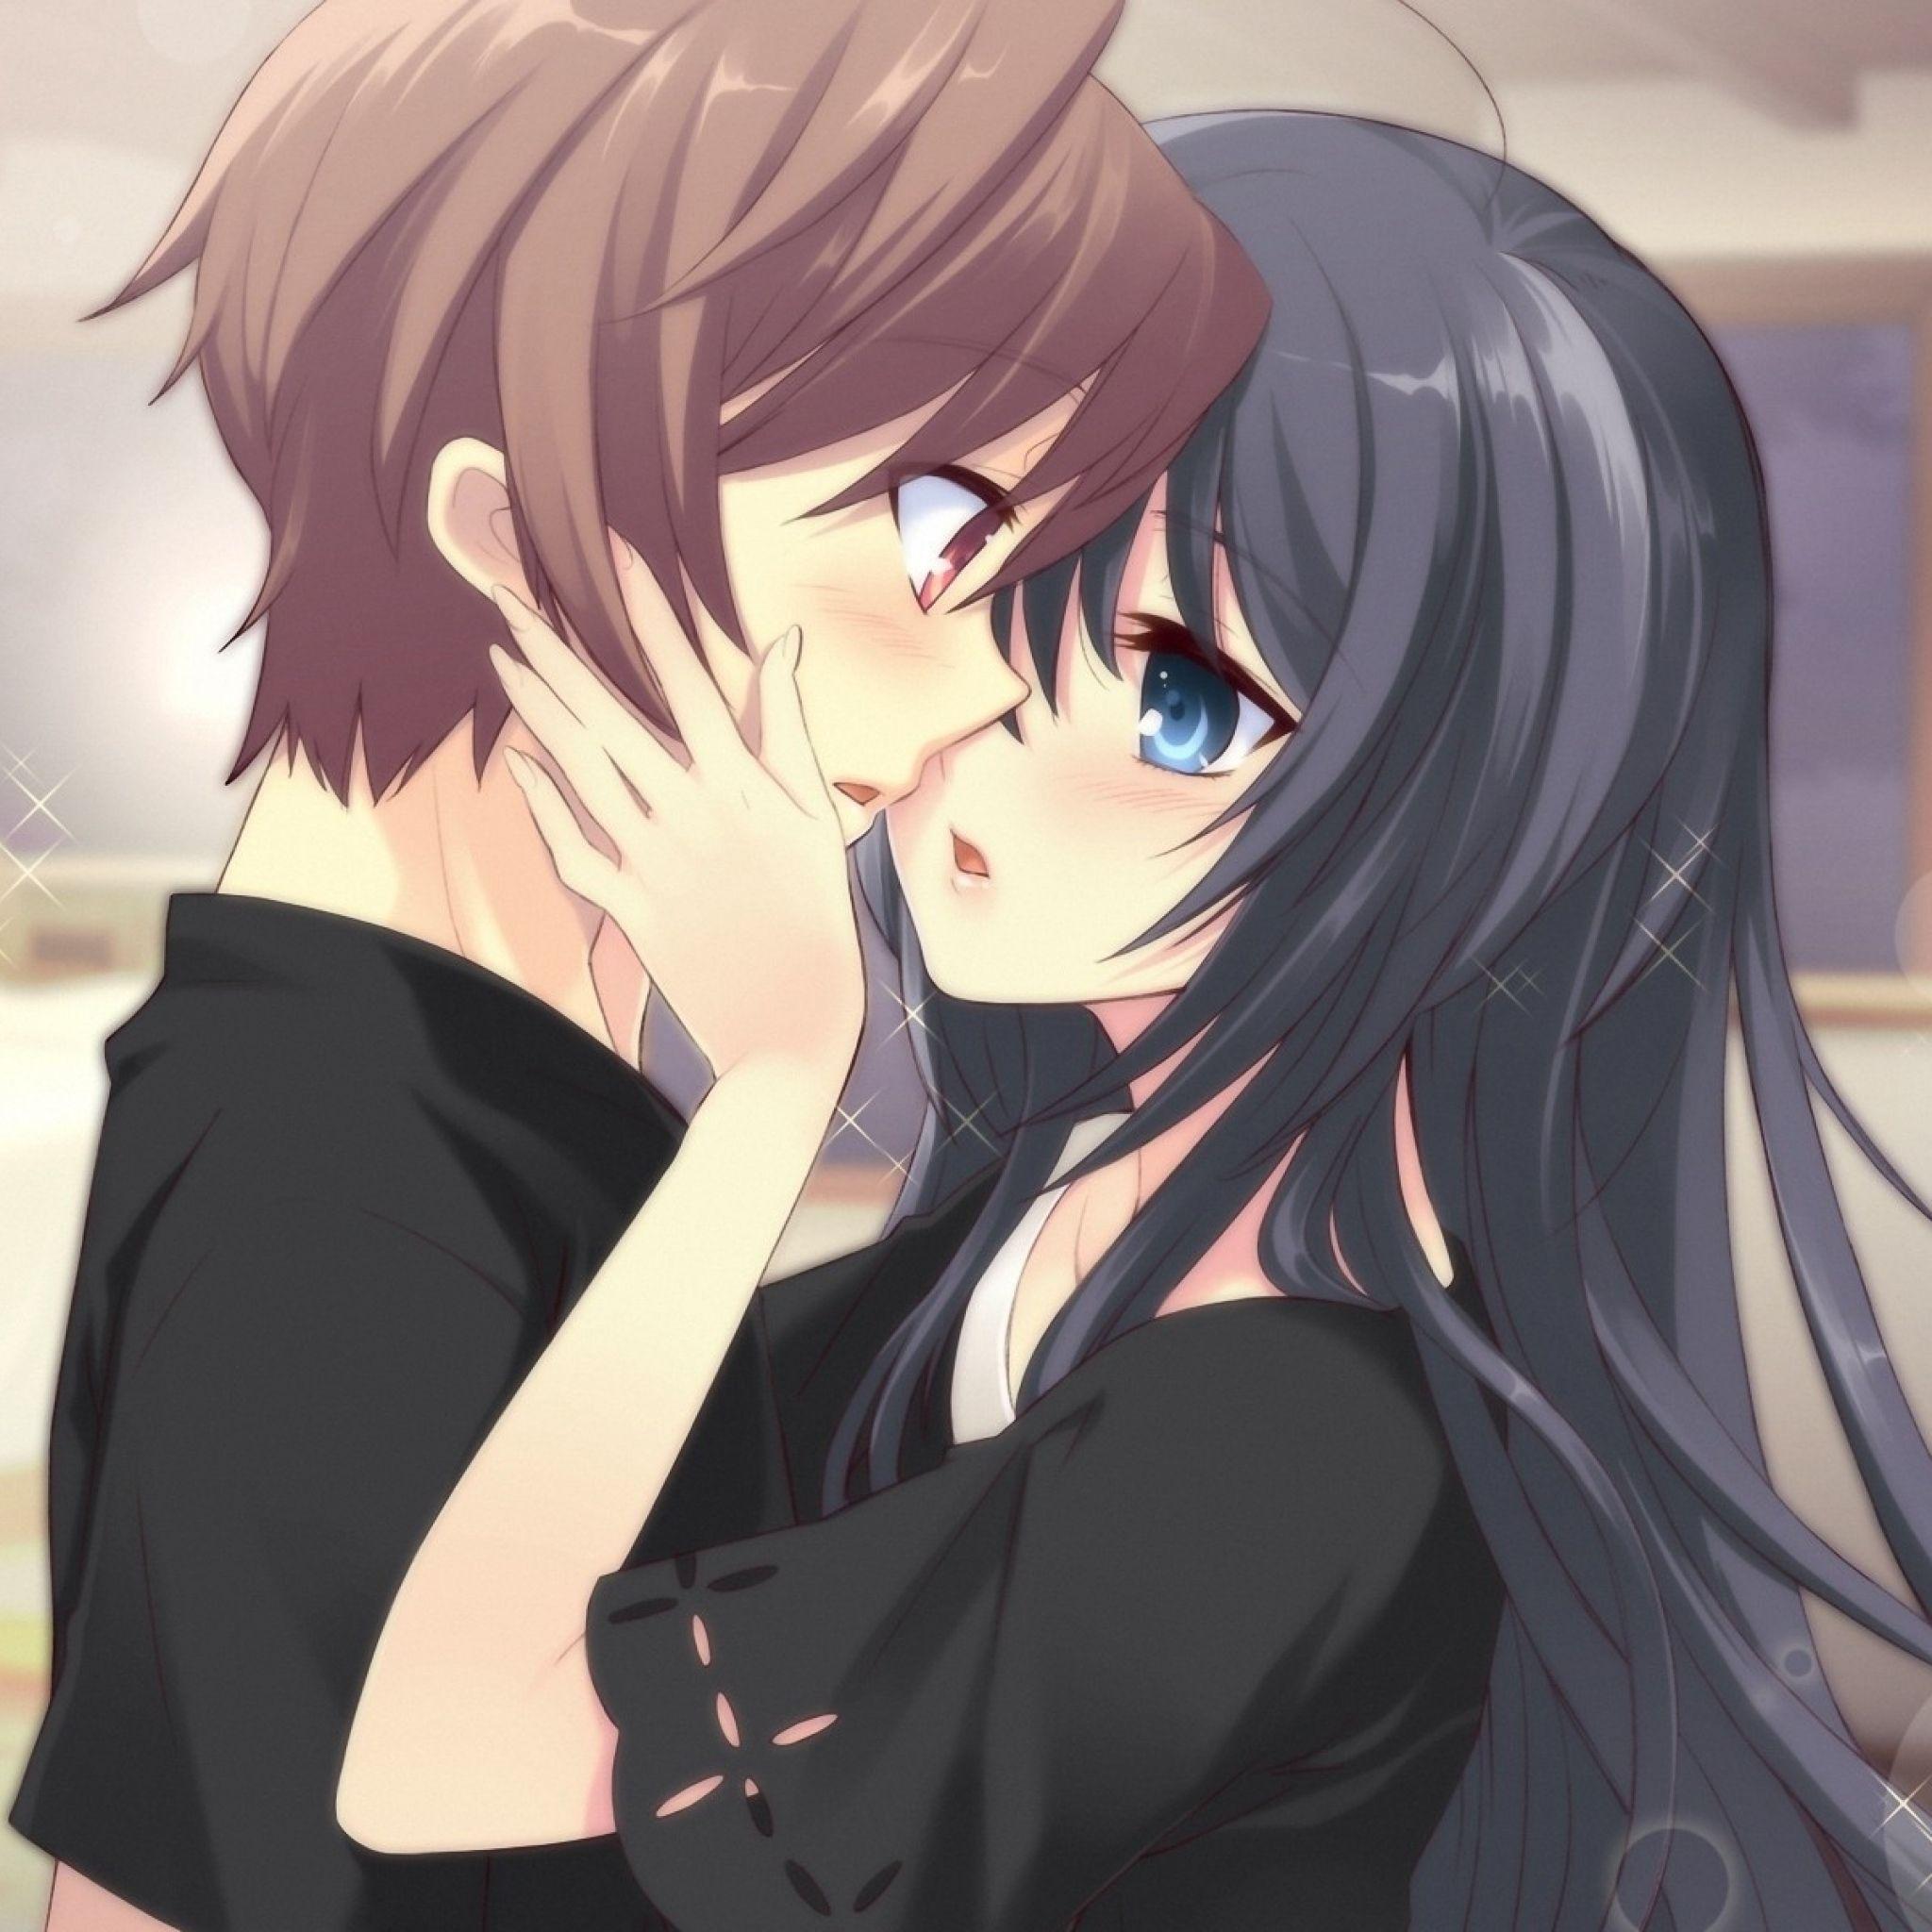 2048x2048 Wallpaper Anime Boy Girl Tenderness Kiss Room Android Wallpaper Anime Anime Wallpaper Phone Anime Wallpaper Download